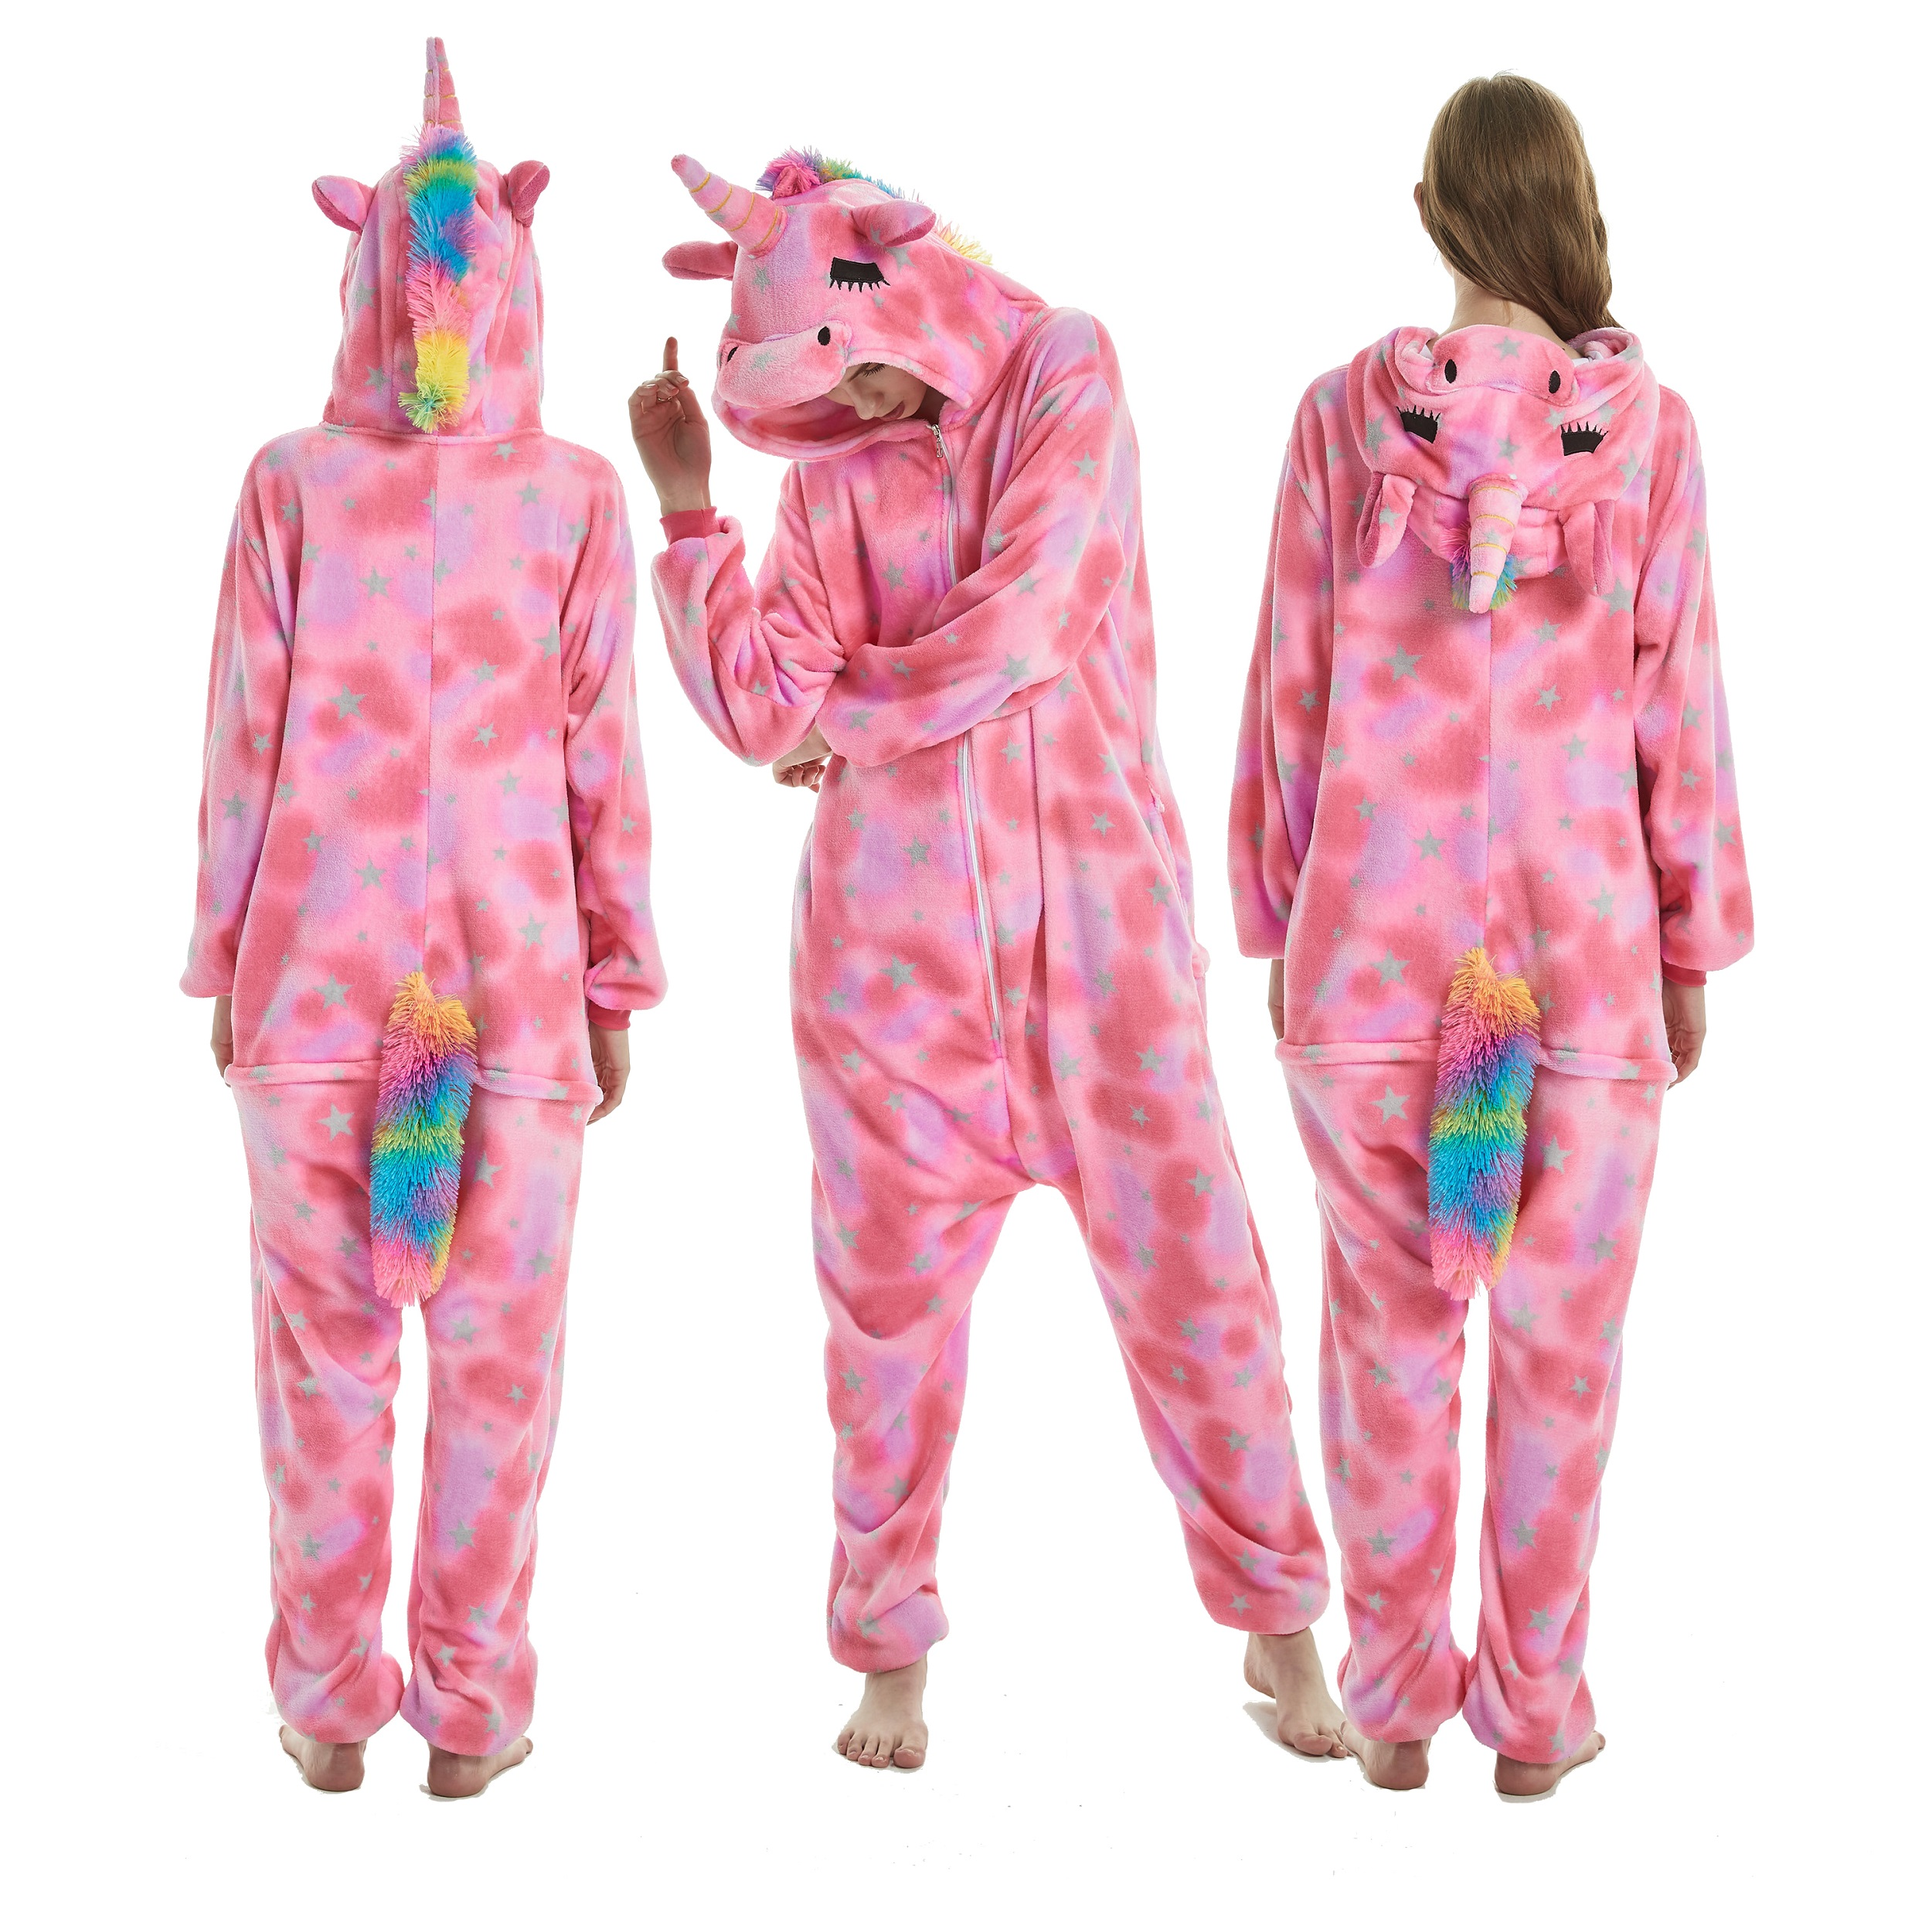 Christmas Pajamas Onesie.Wholesale Super Soft Funny Animal Christmas Onesie Pajamas Flannel Kids Christmas Pajamas For Sale Buy Kids Animal Pajamas Adult Animal